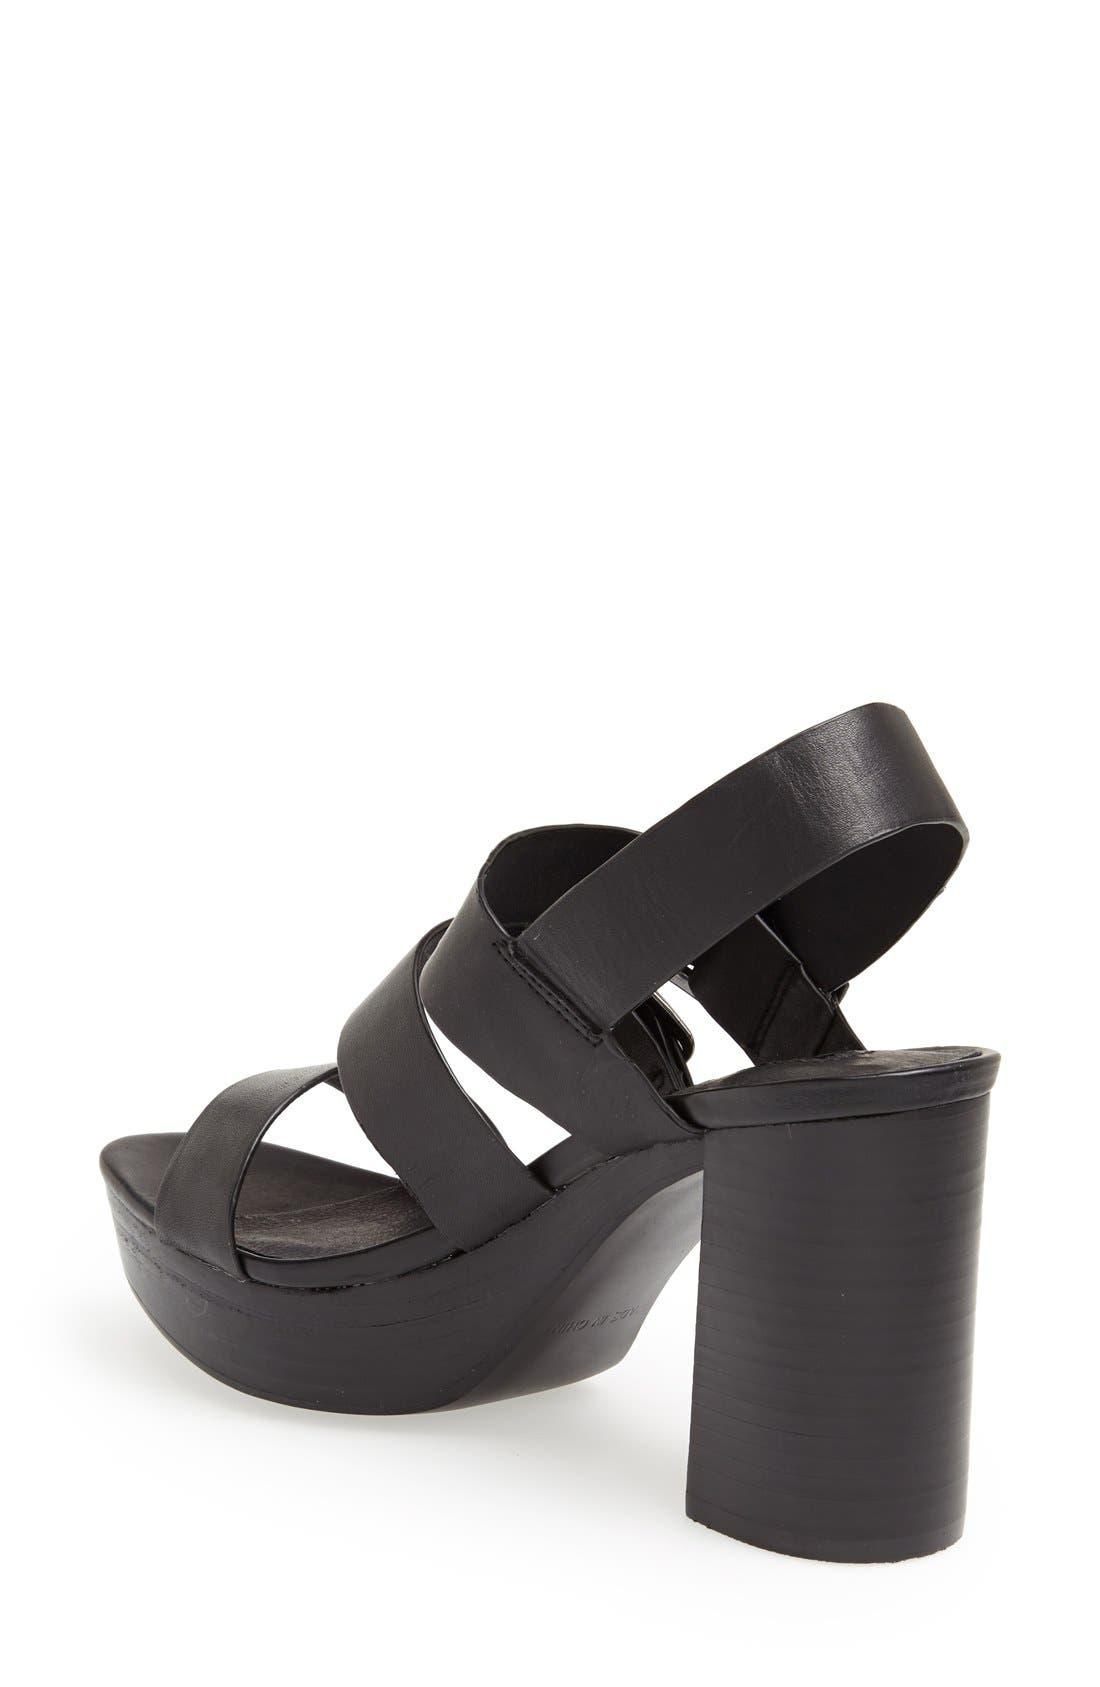 Alternate Image 2  - Topshop 'Lawless' Platform Sandal (Women)